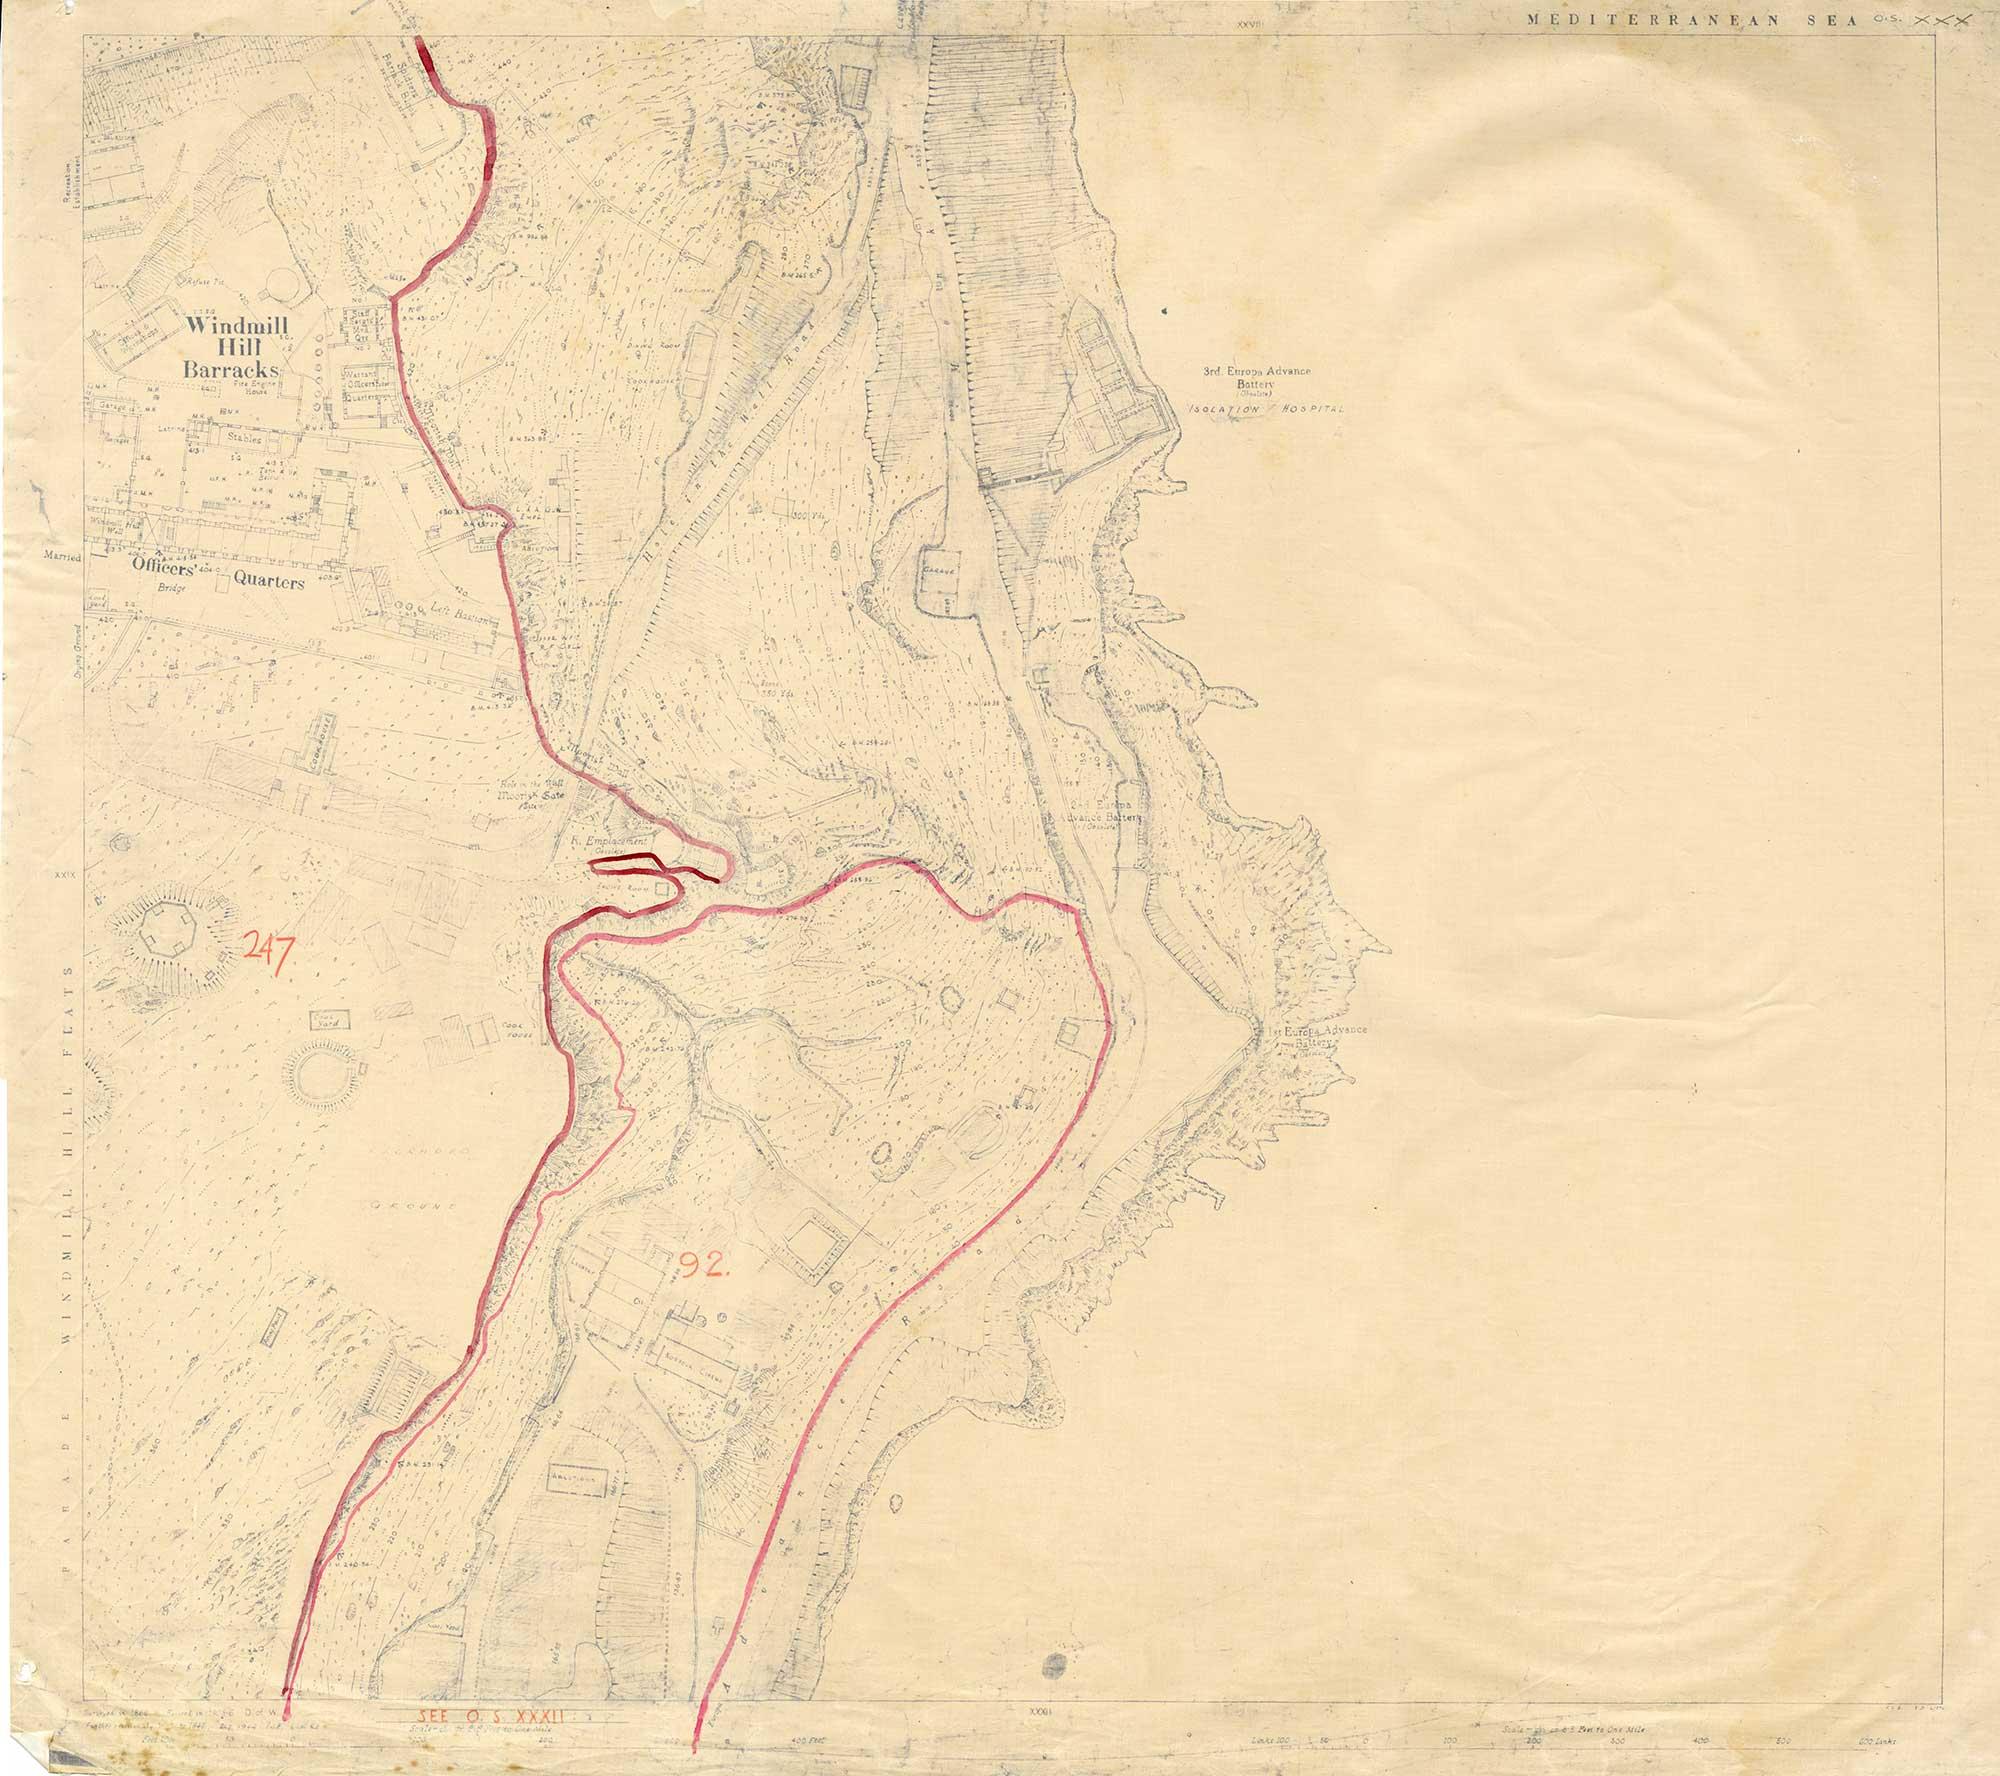 Map-34-Sheet-30-Windmill-Hill-Barracks-1941